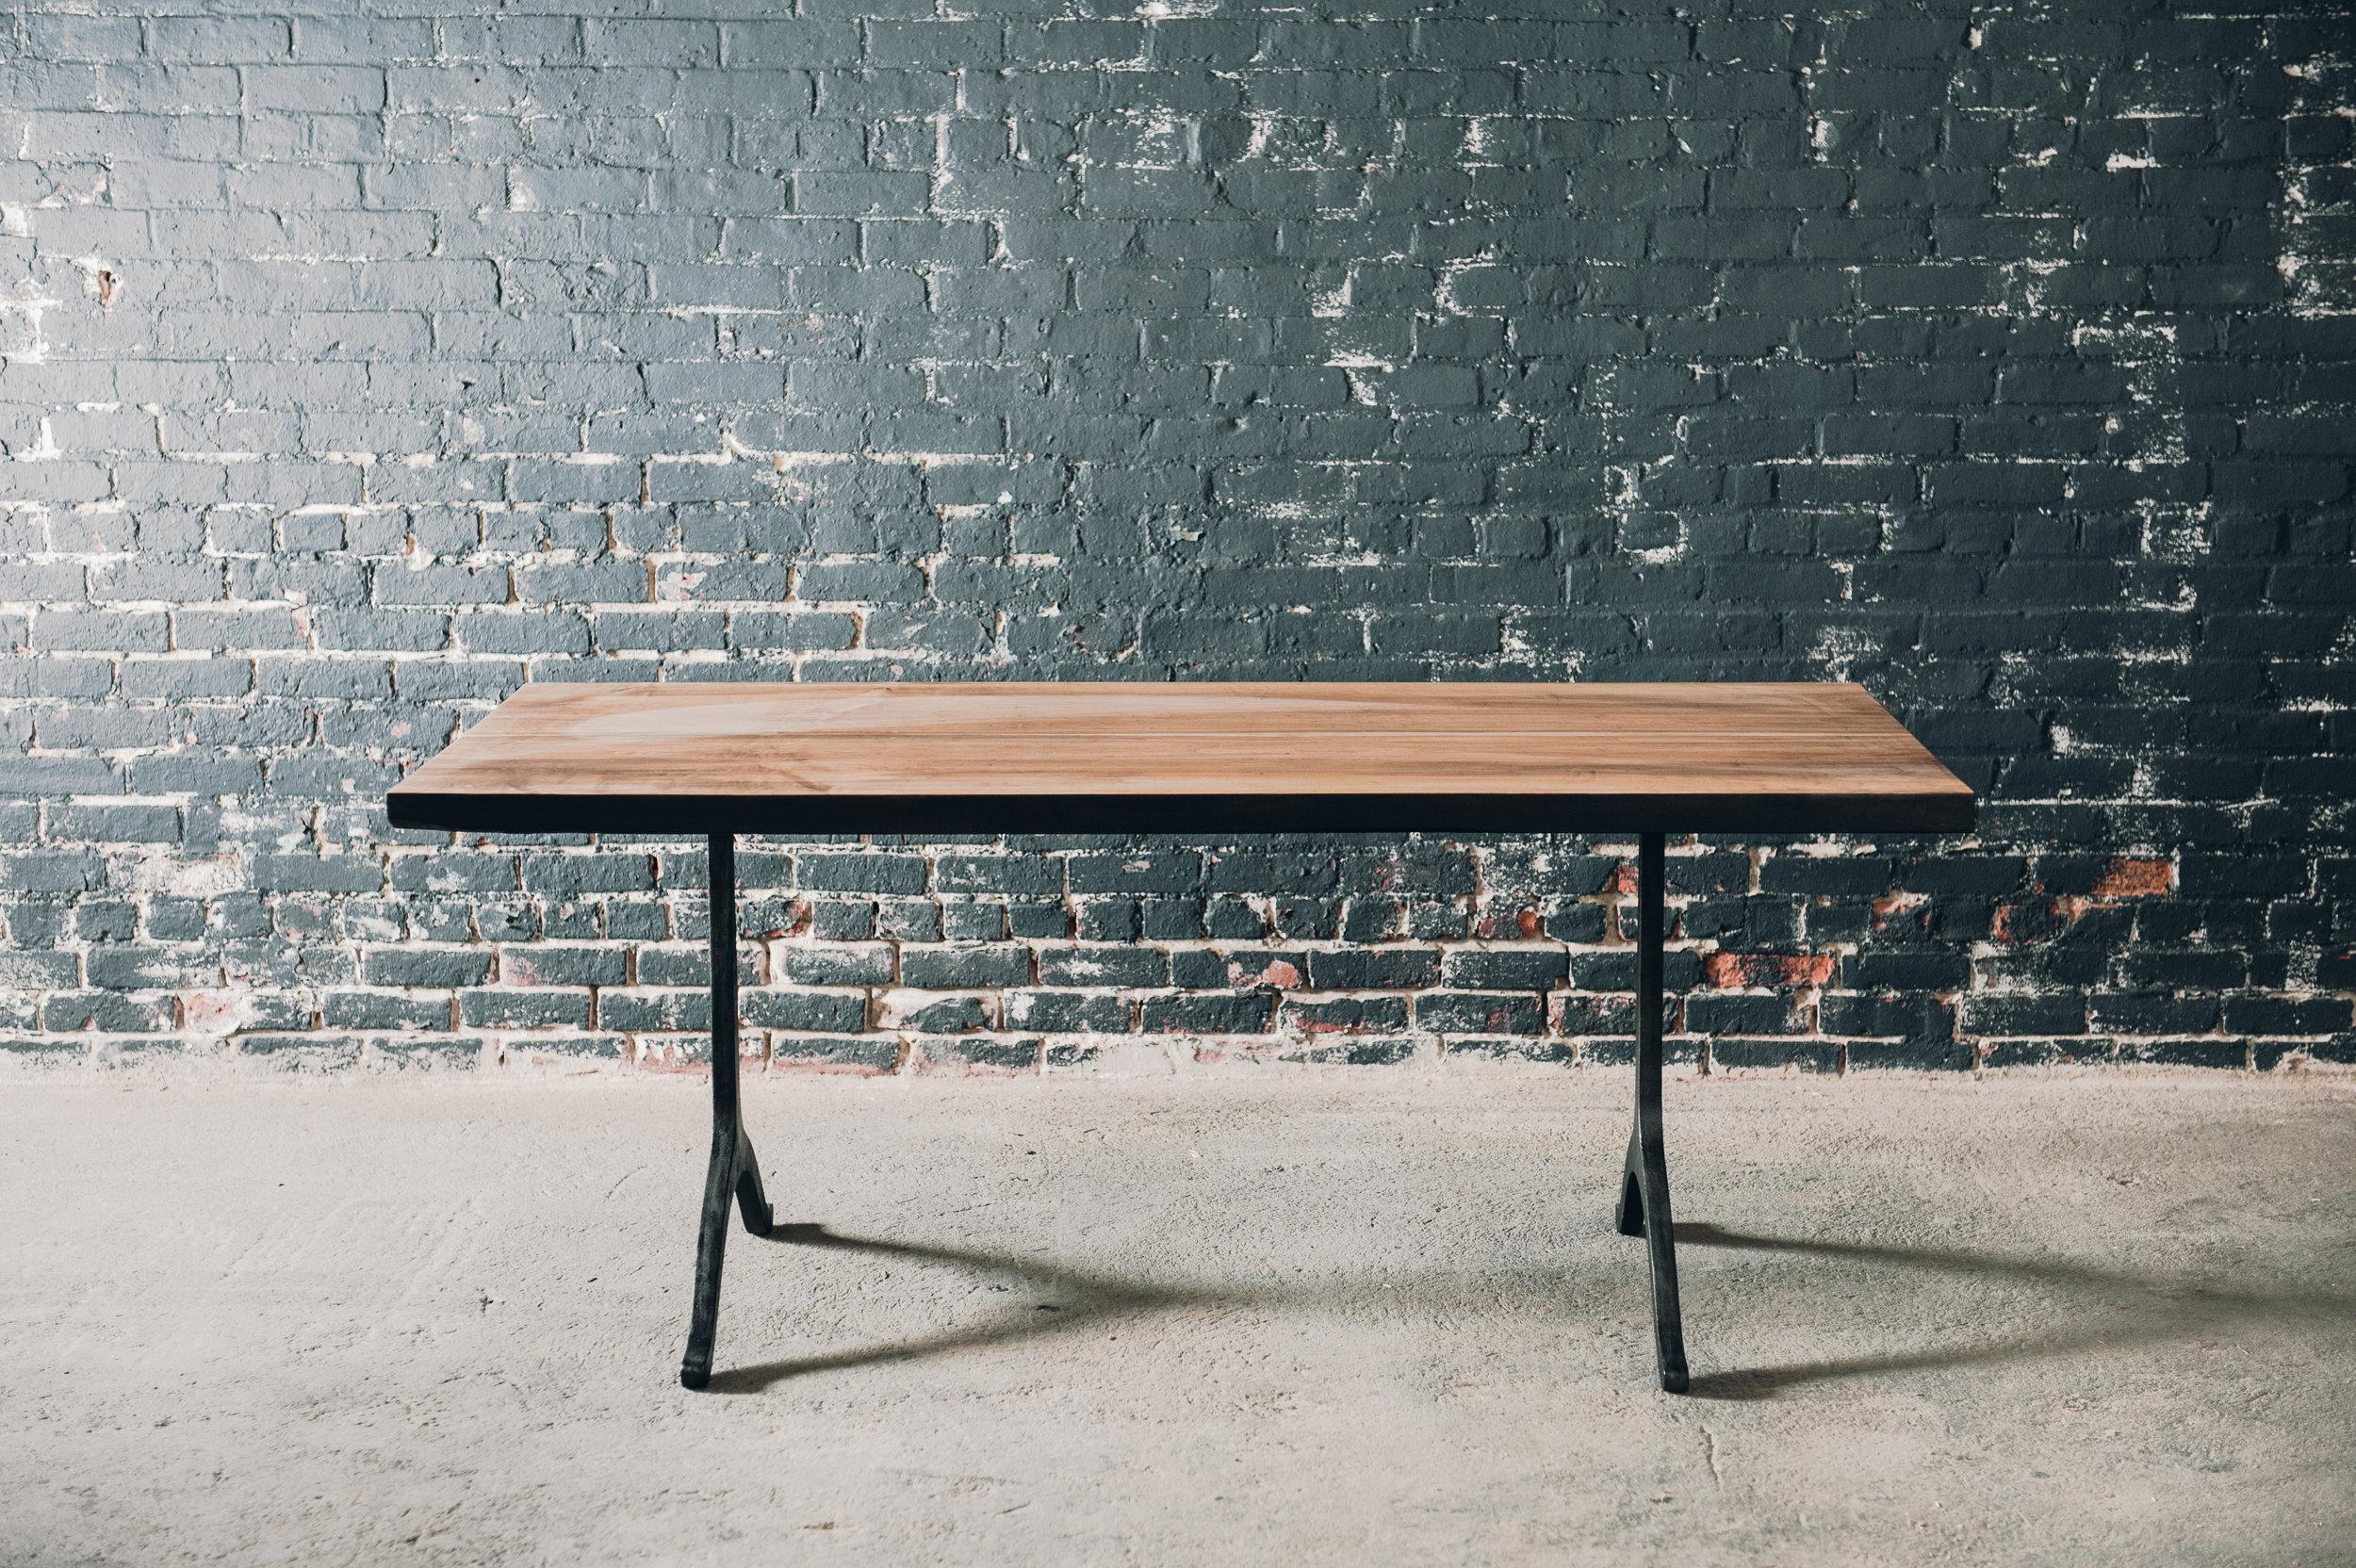 Mable_Table-9981.jpg